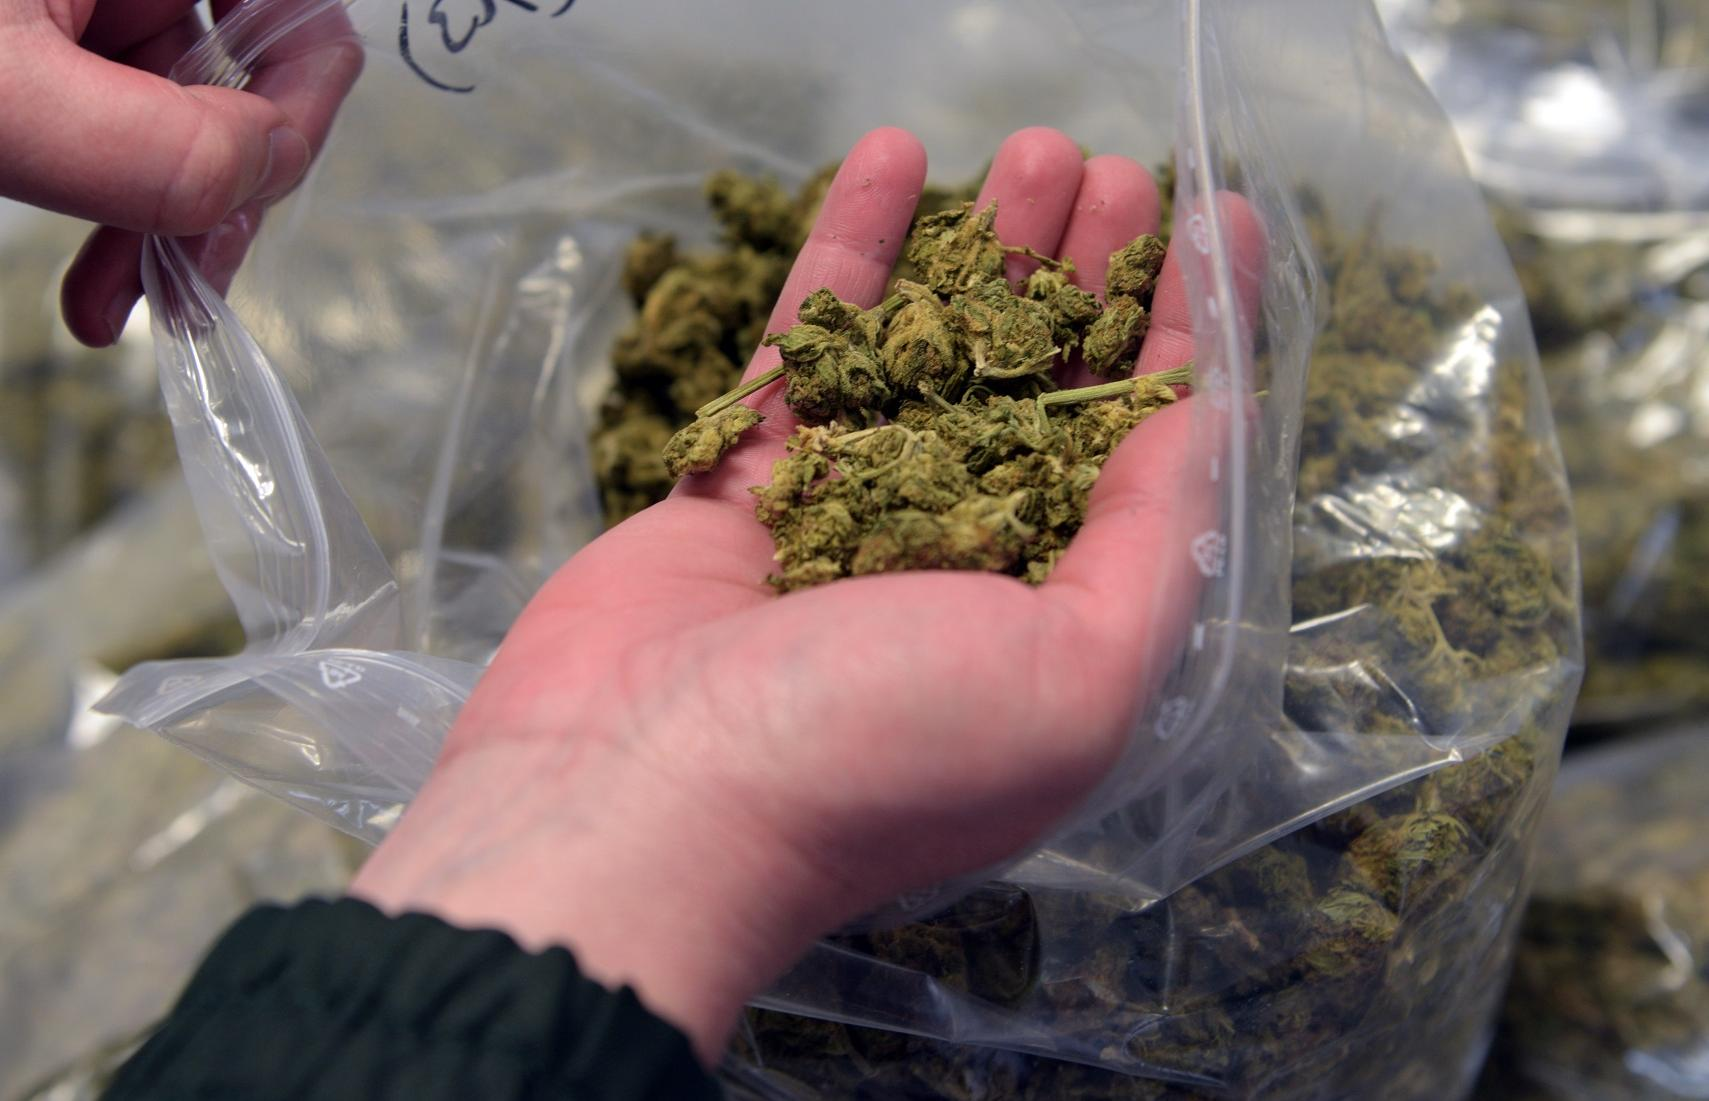 В Тверской области мужчину задержали за хранение наркотиков - новости Афанасий